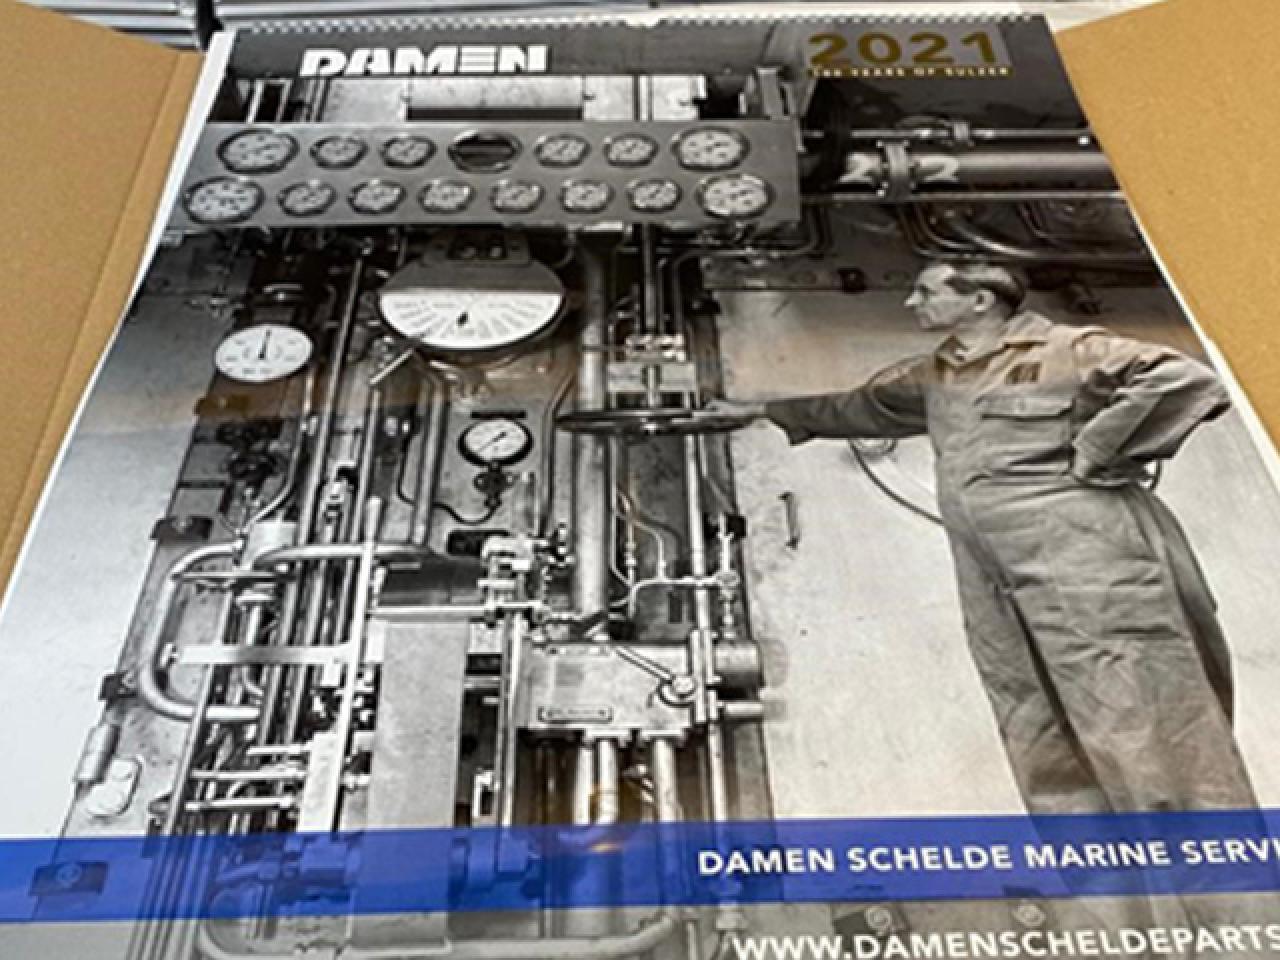 Damen Schelde Marine Services calendar 2021